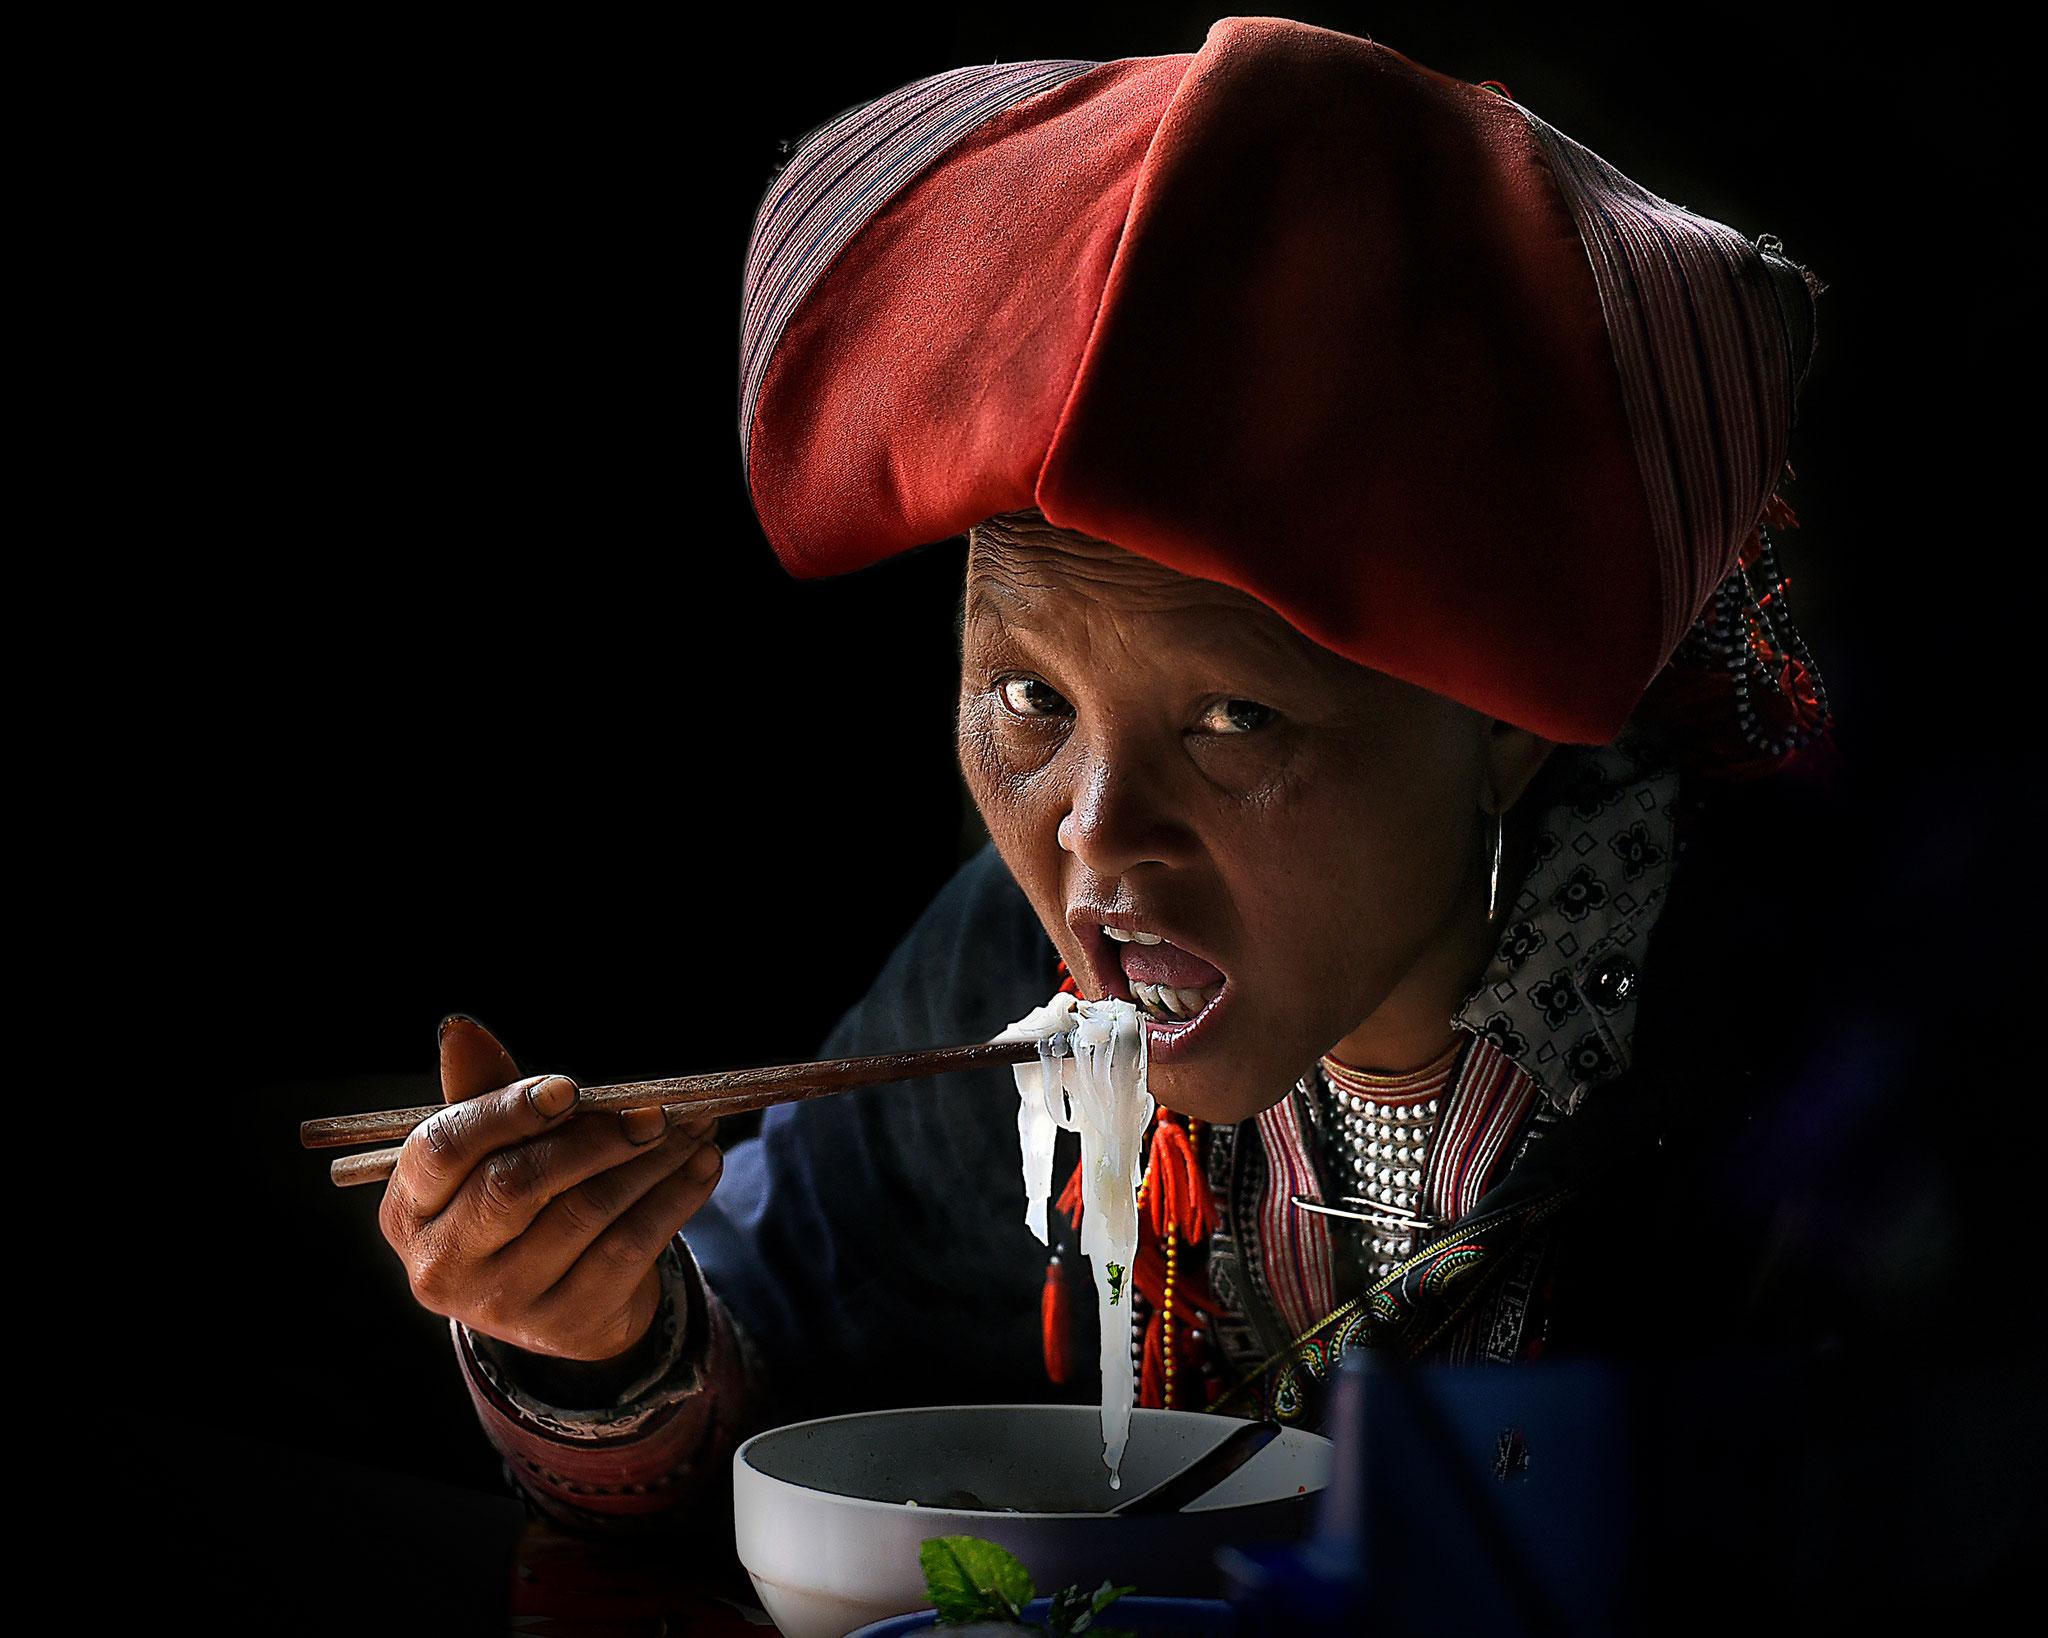 Irene Perovich (Italy) -  Dzao woman eating